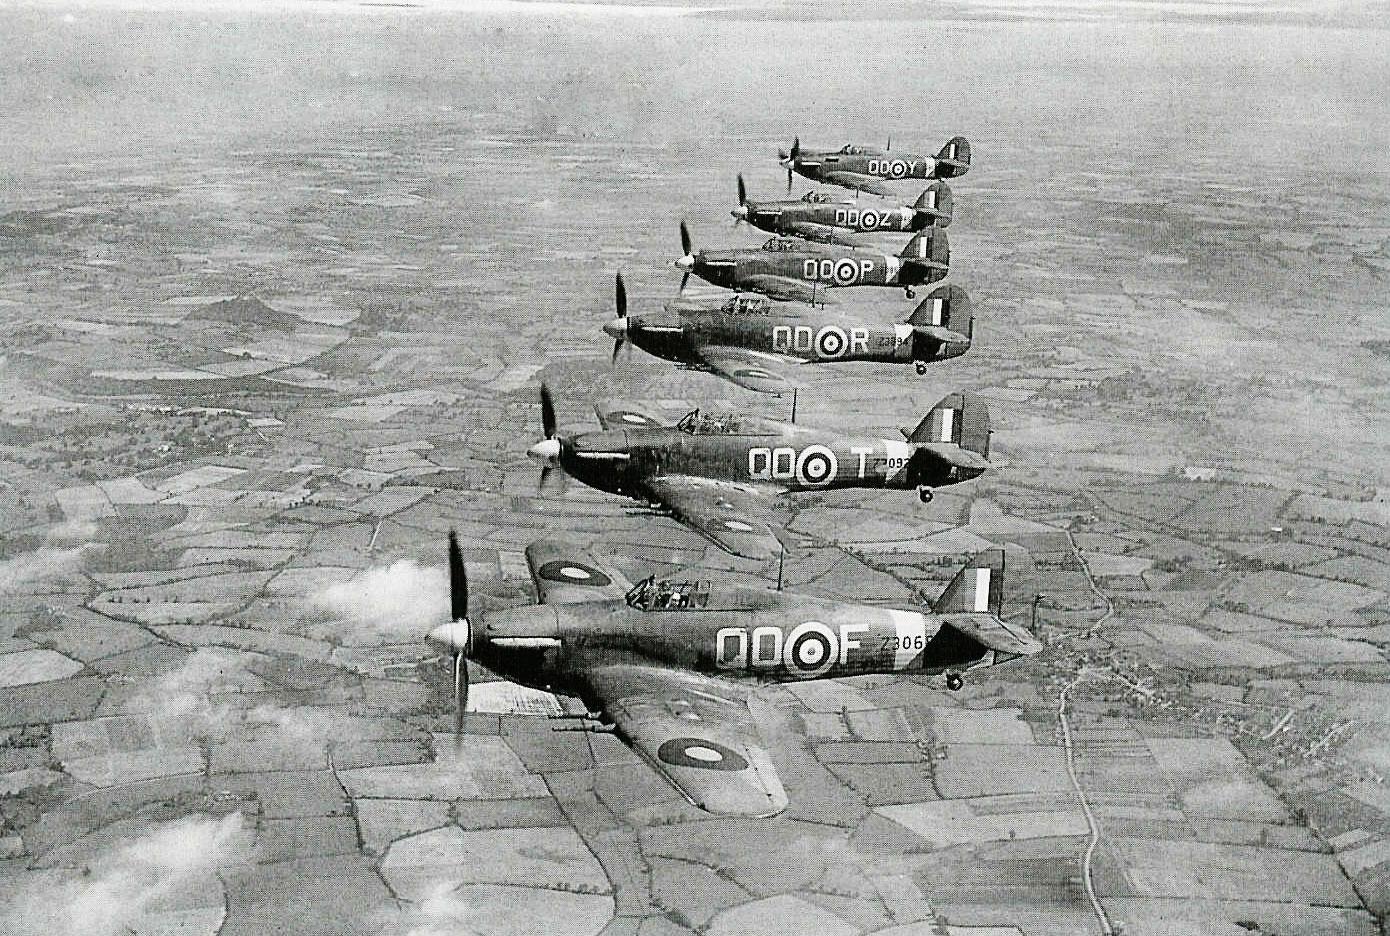 Hawker Hurricane IIc RAF 3Sqn QOF QOT QOR QOP QOZ QOY based at Stapleford Tawney 1941 IWM CH3497